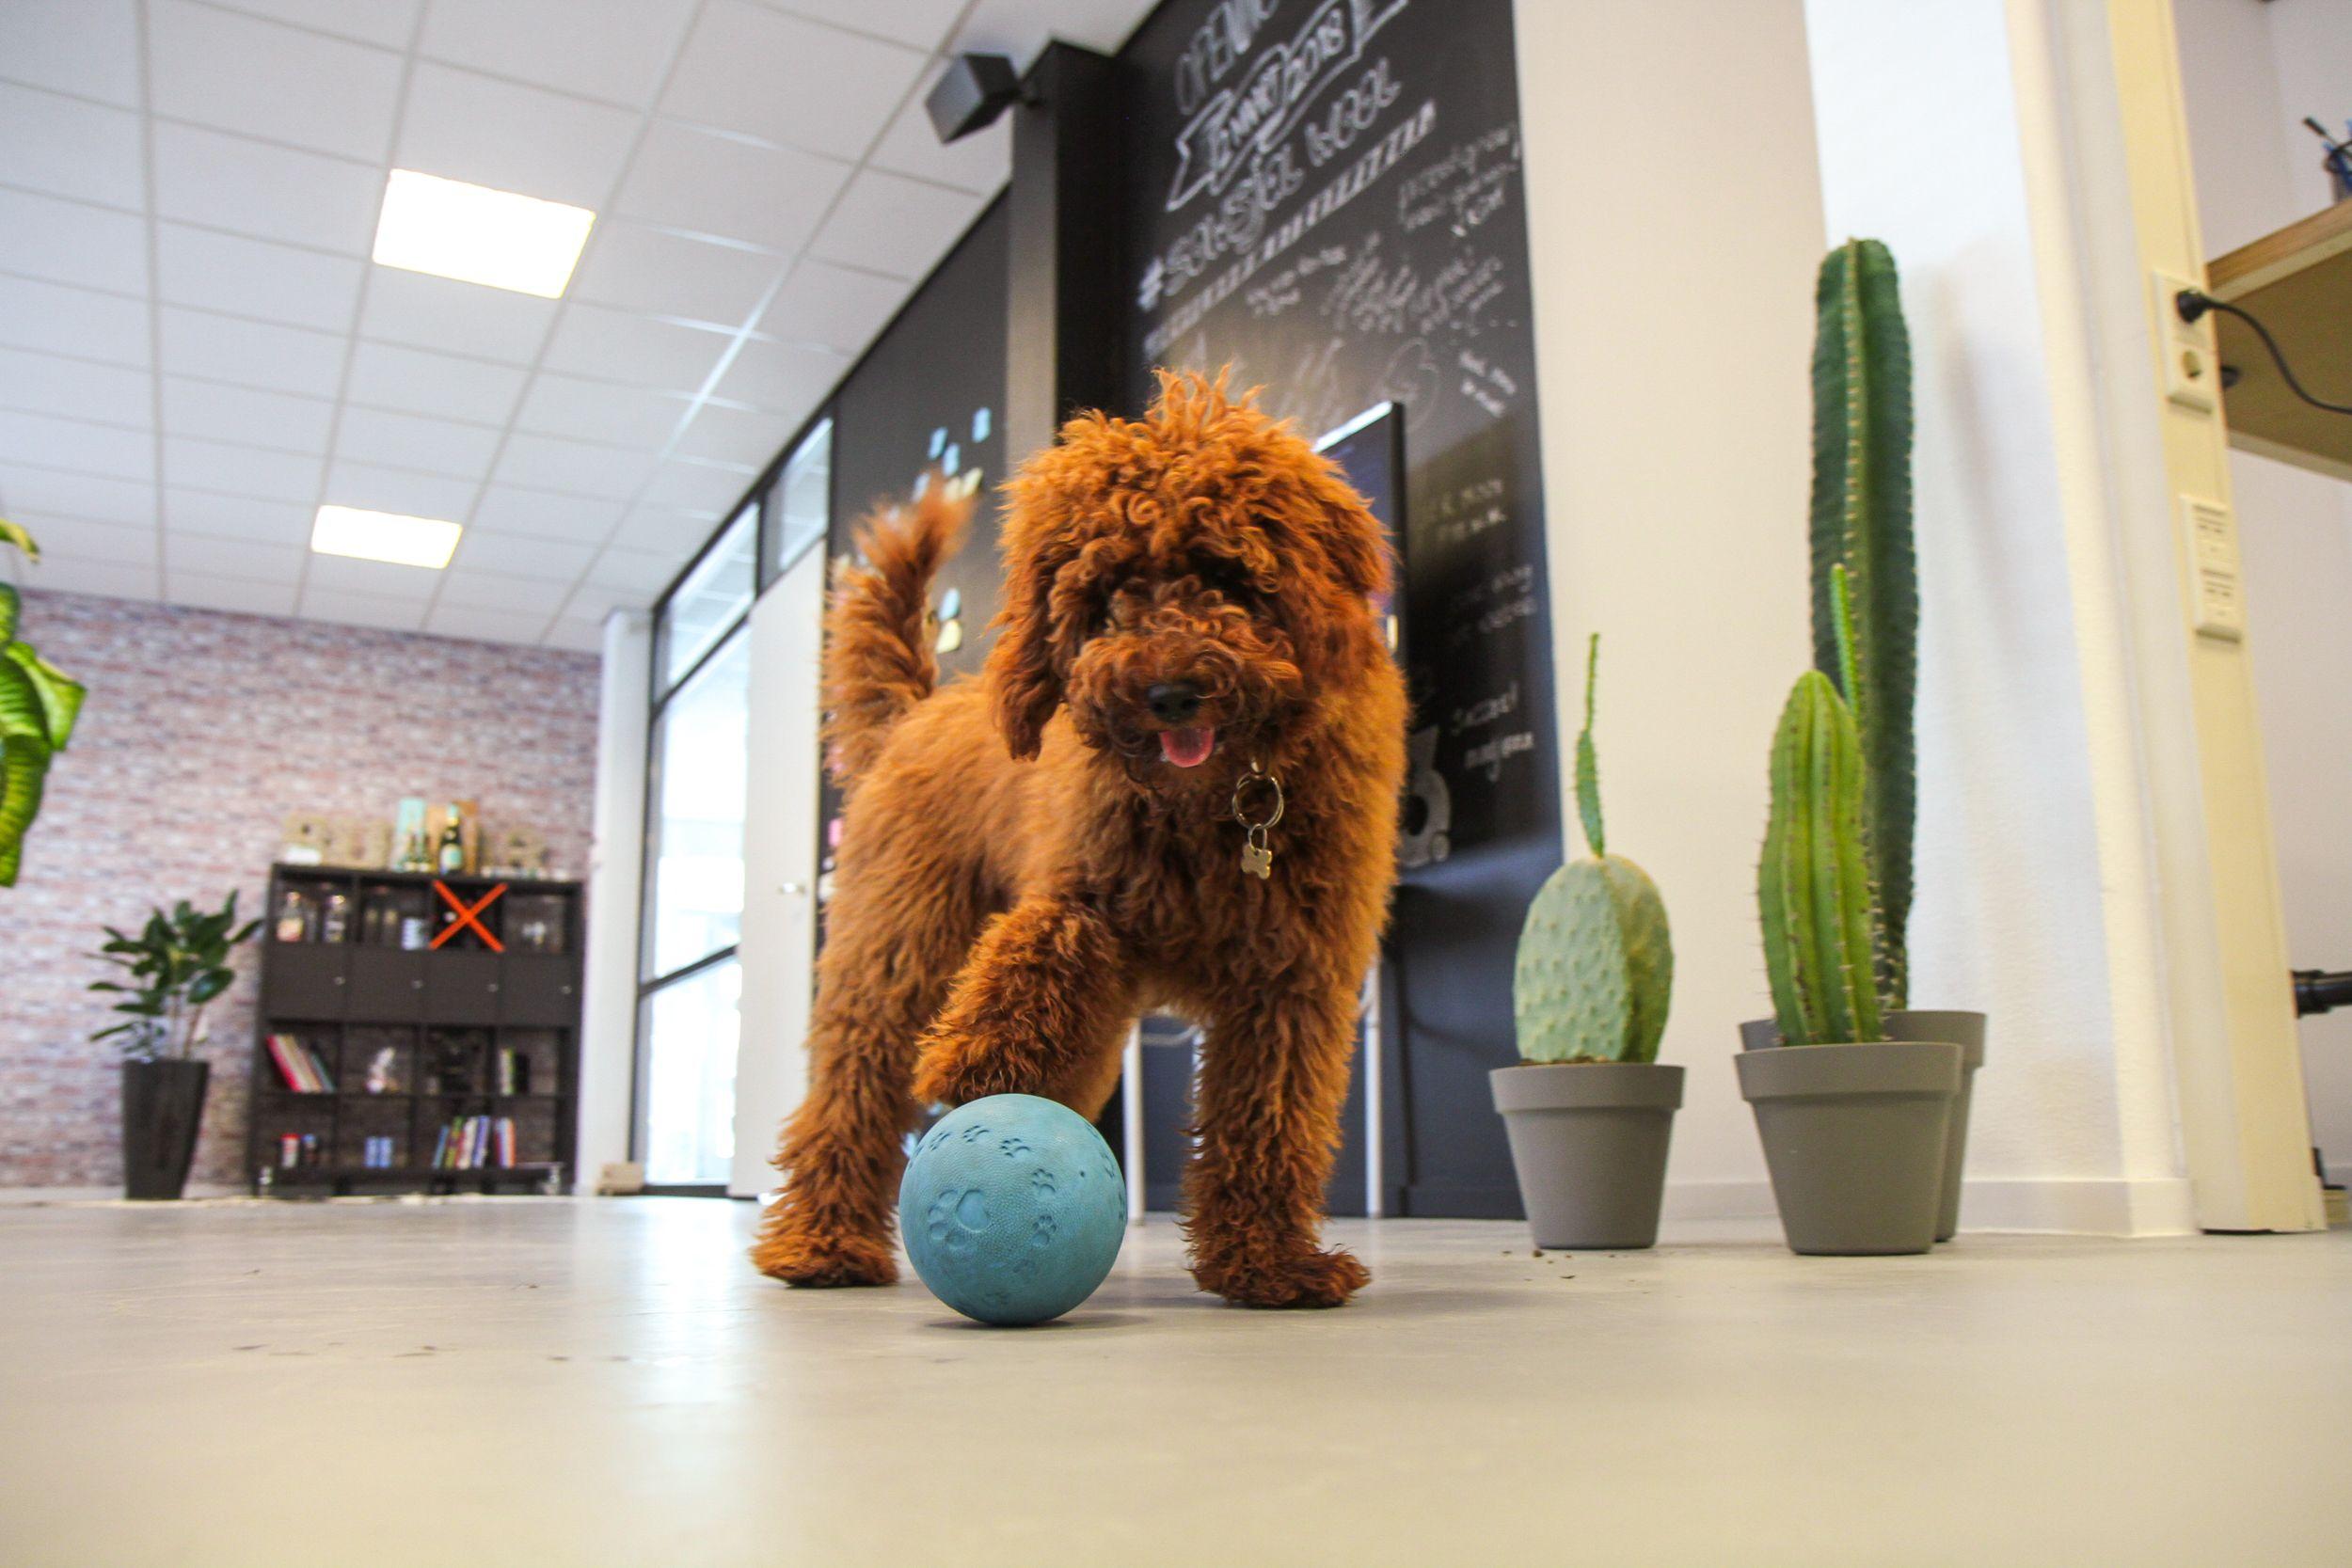 Sammie the officedog